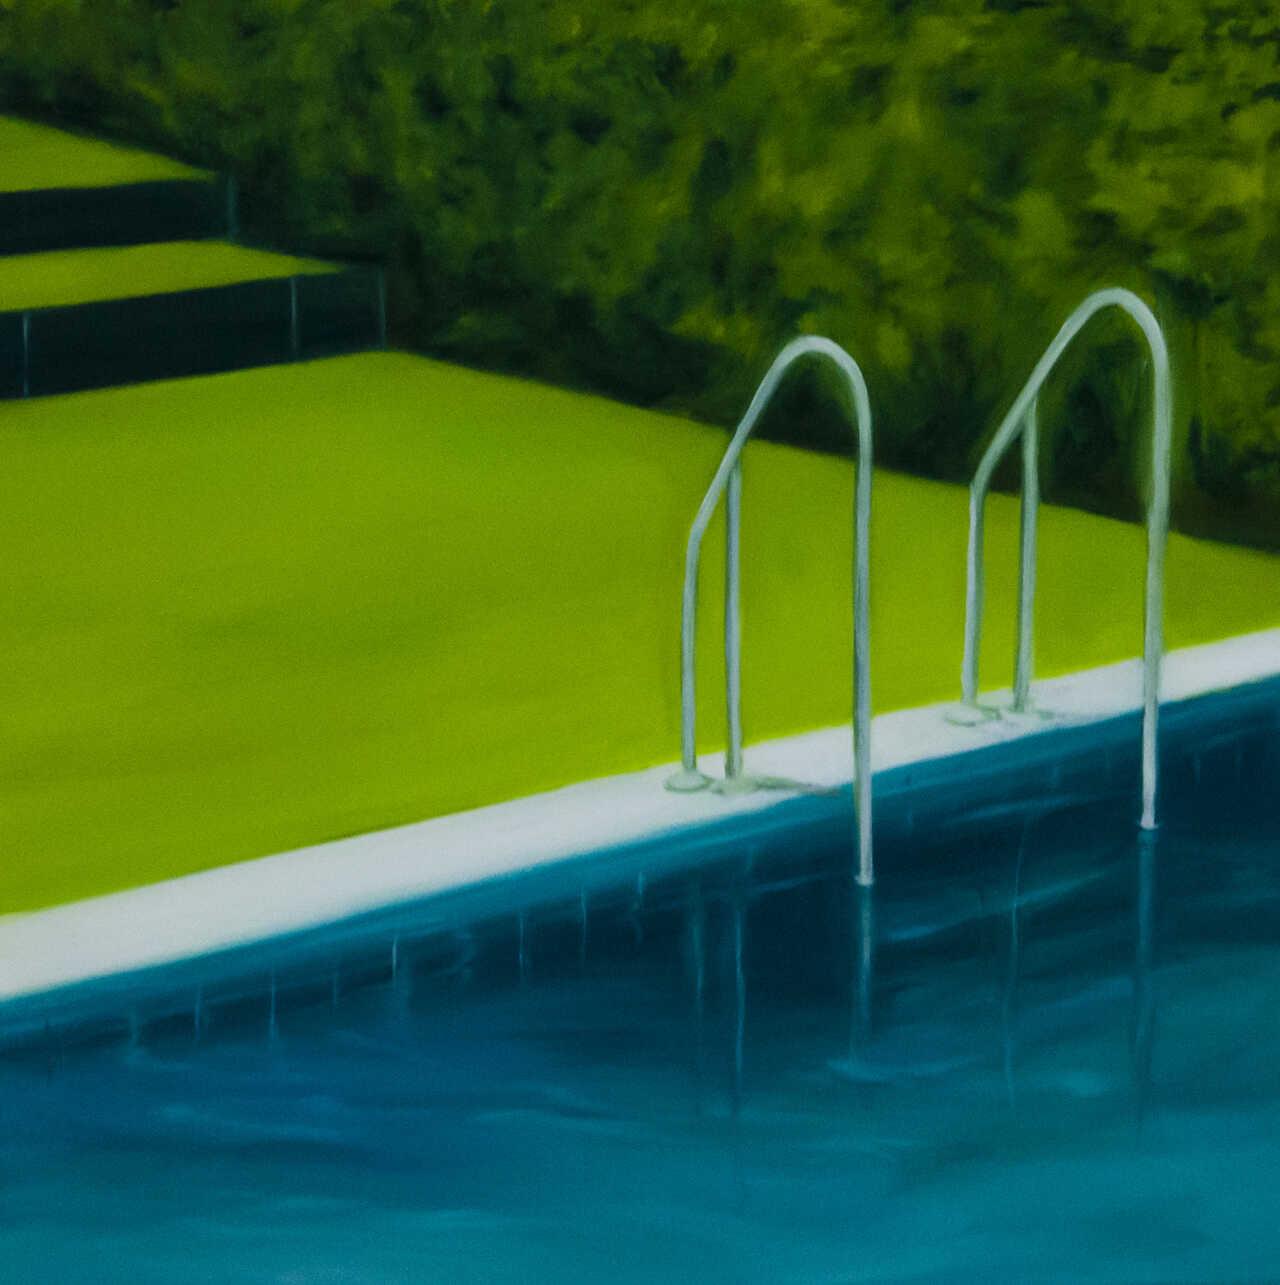 Rest in Pool, 2020, λάδι σε καμβά, 50x50 εκ.